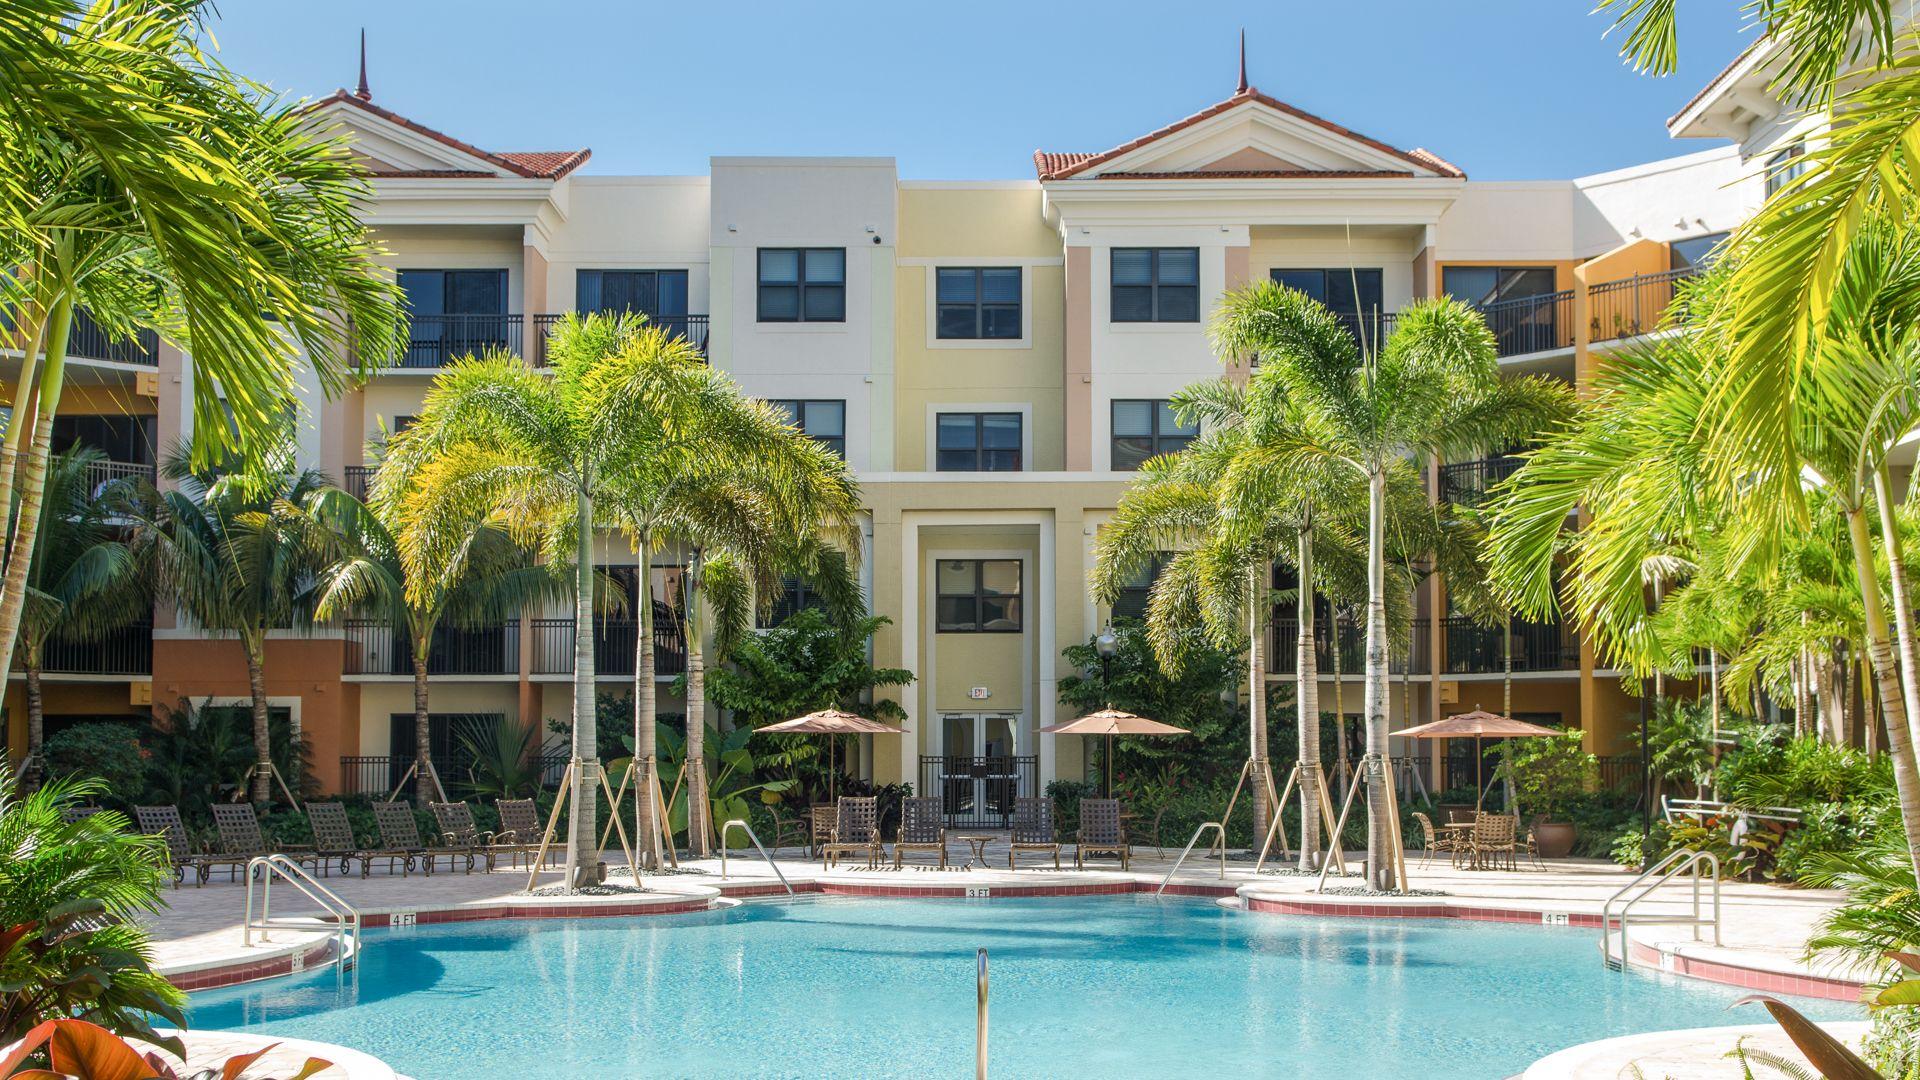 Nexus Sawgrass Apartments - Swimming Pool